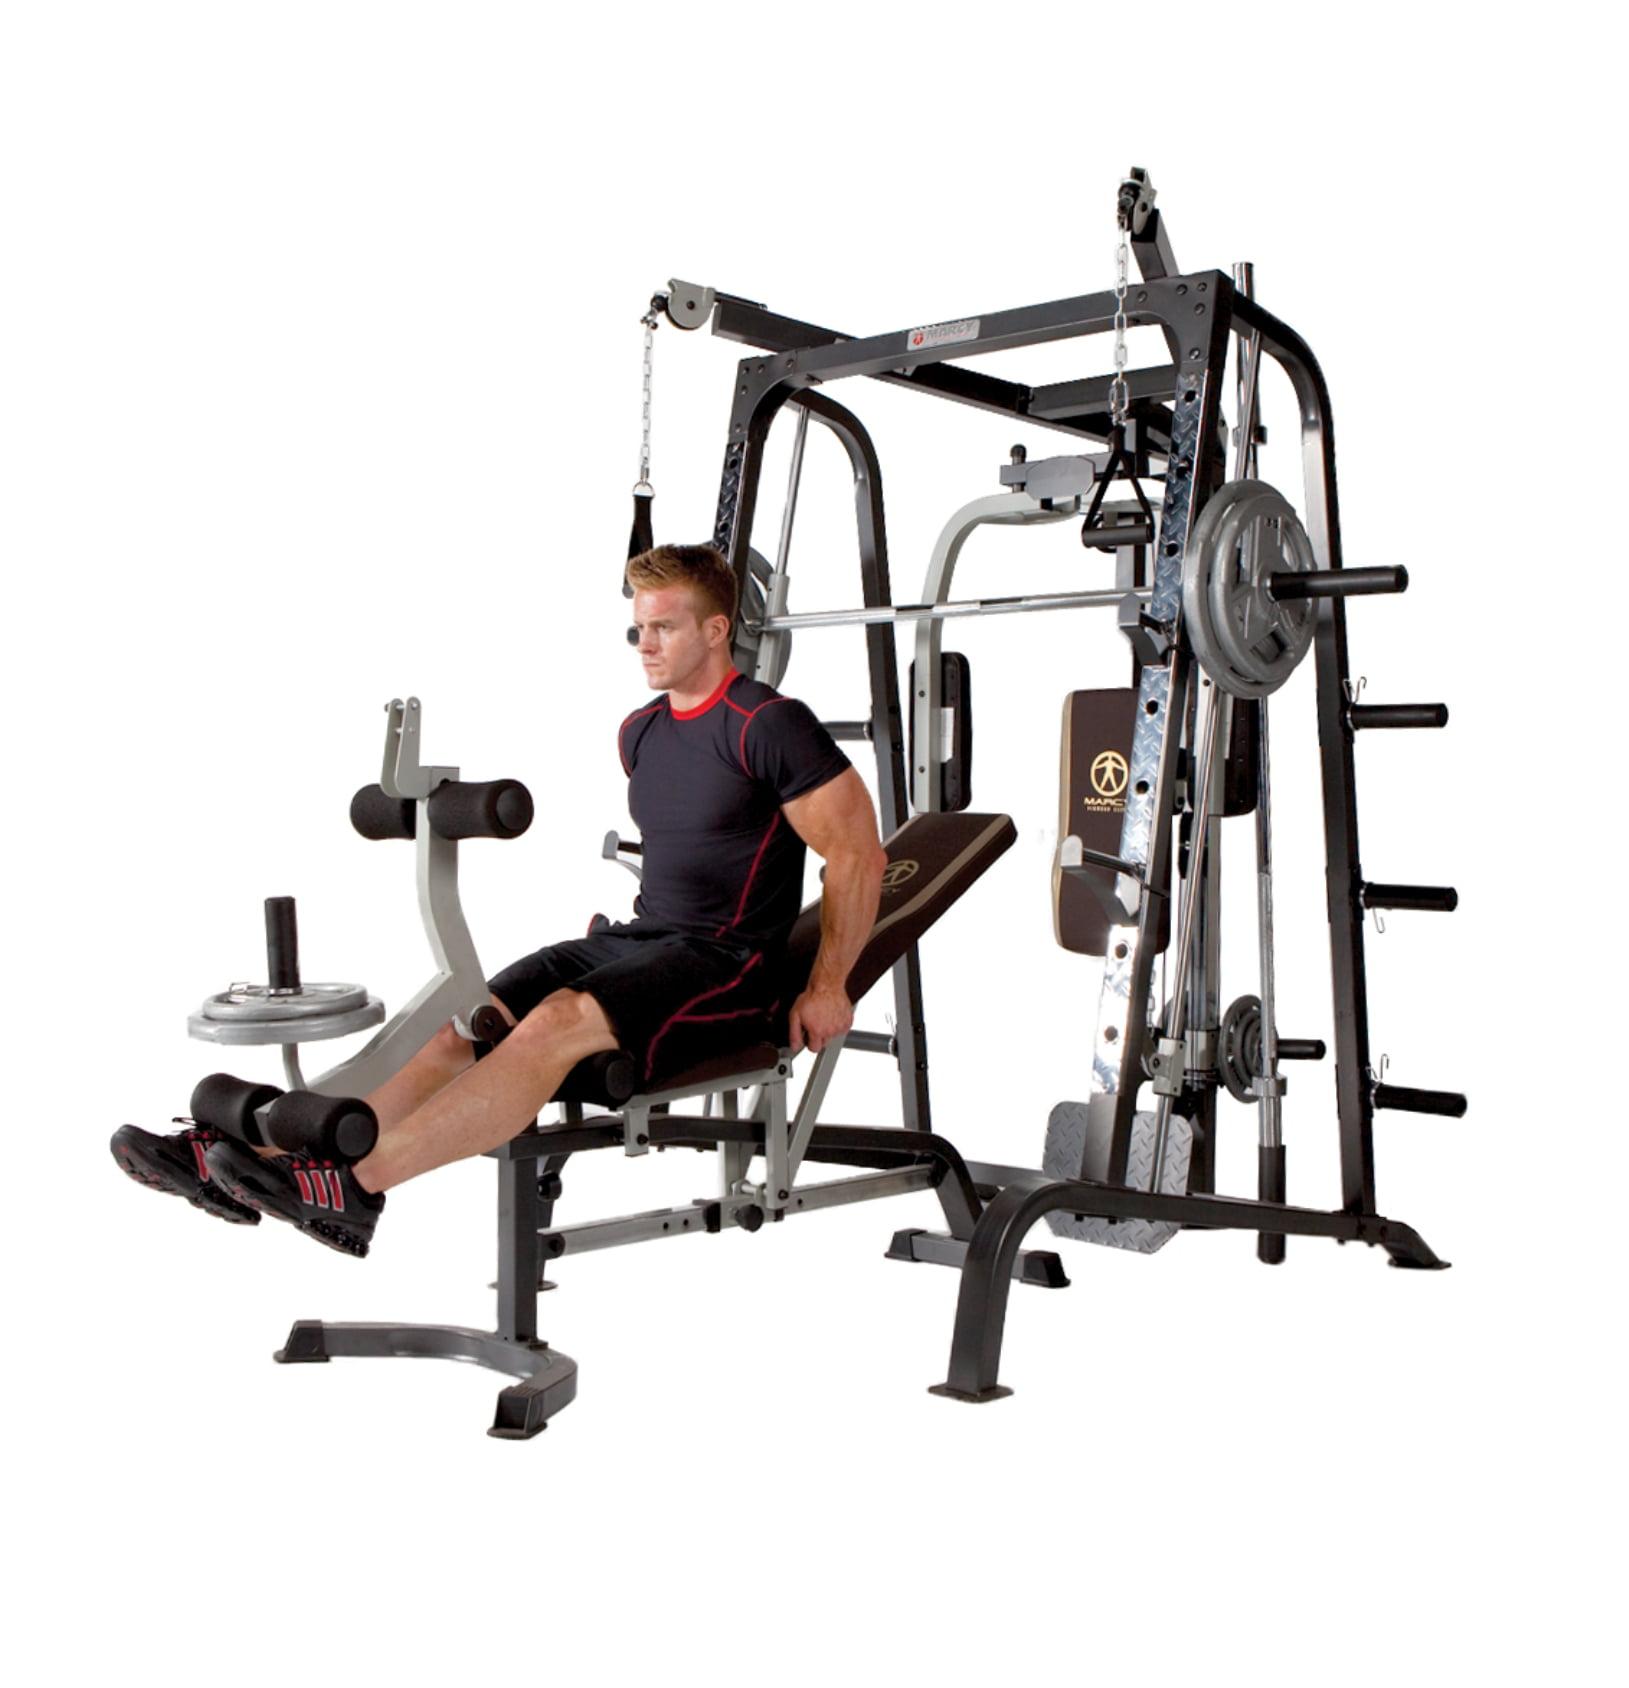 Marcy Deluxe Diamond Elite Smith Cage Workout Machine Total Body Gym